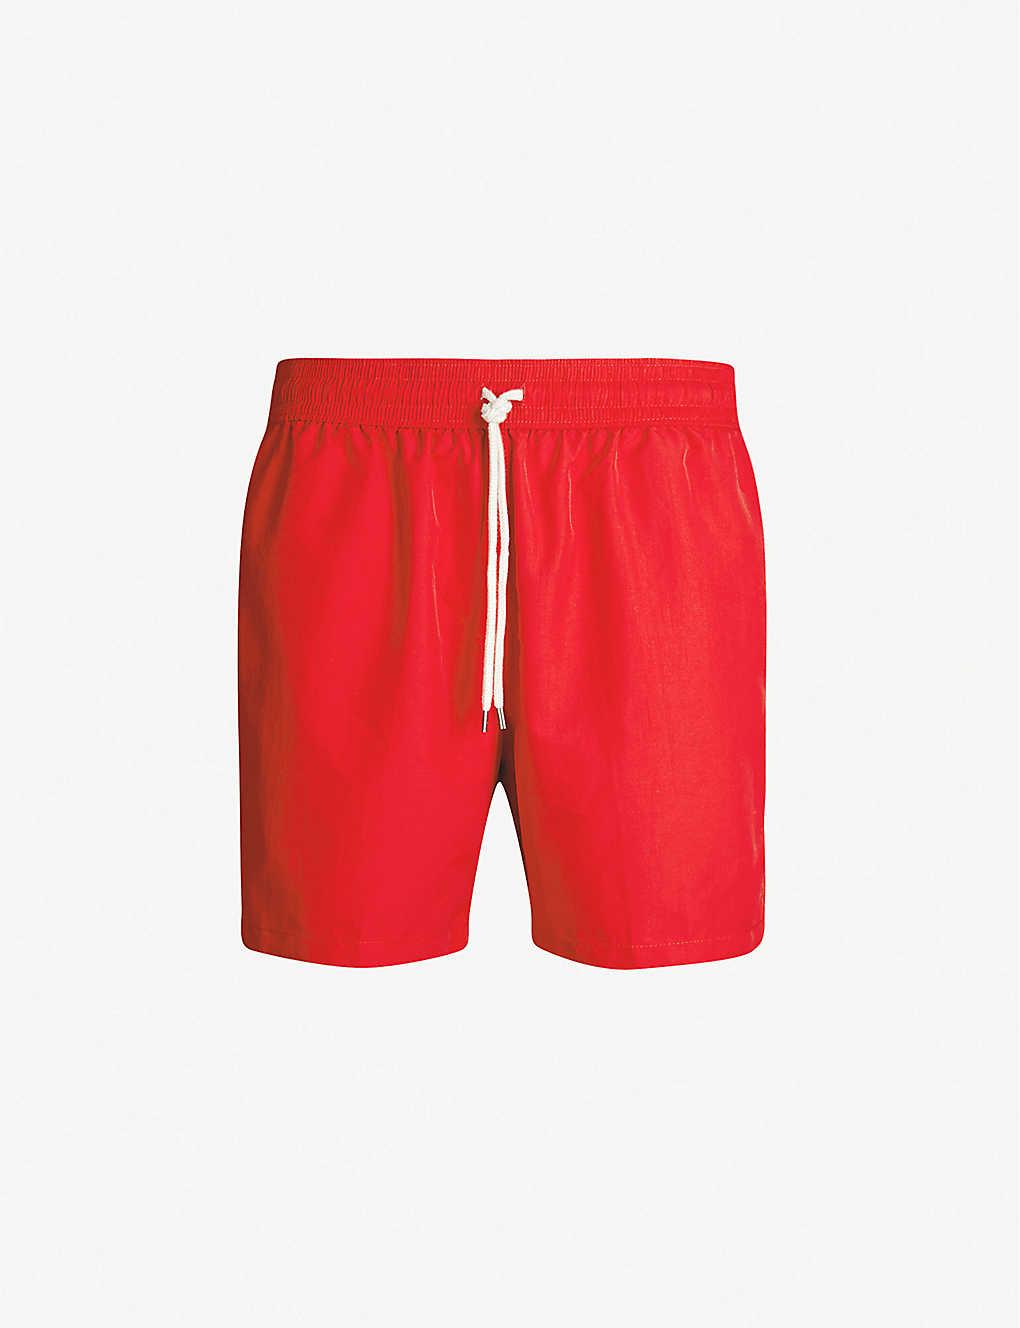 b9e86b19a4 POLO RALPH LAUREN - Traveller logo-embroidered swim shorts ...